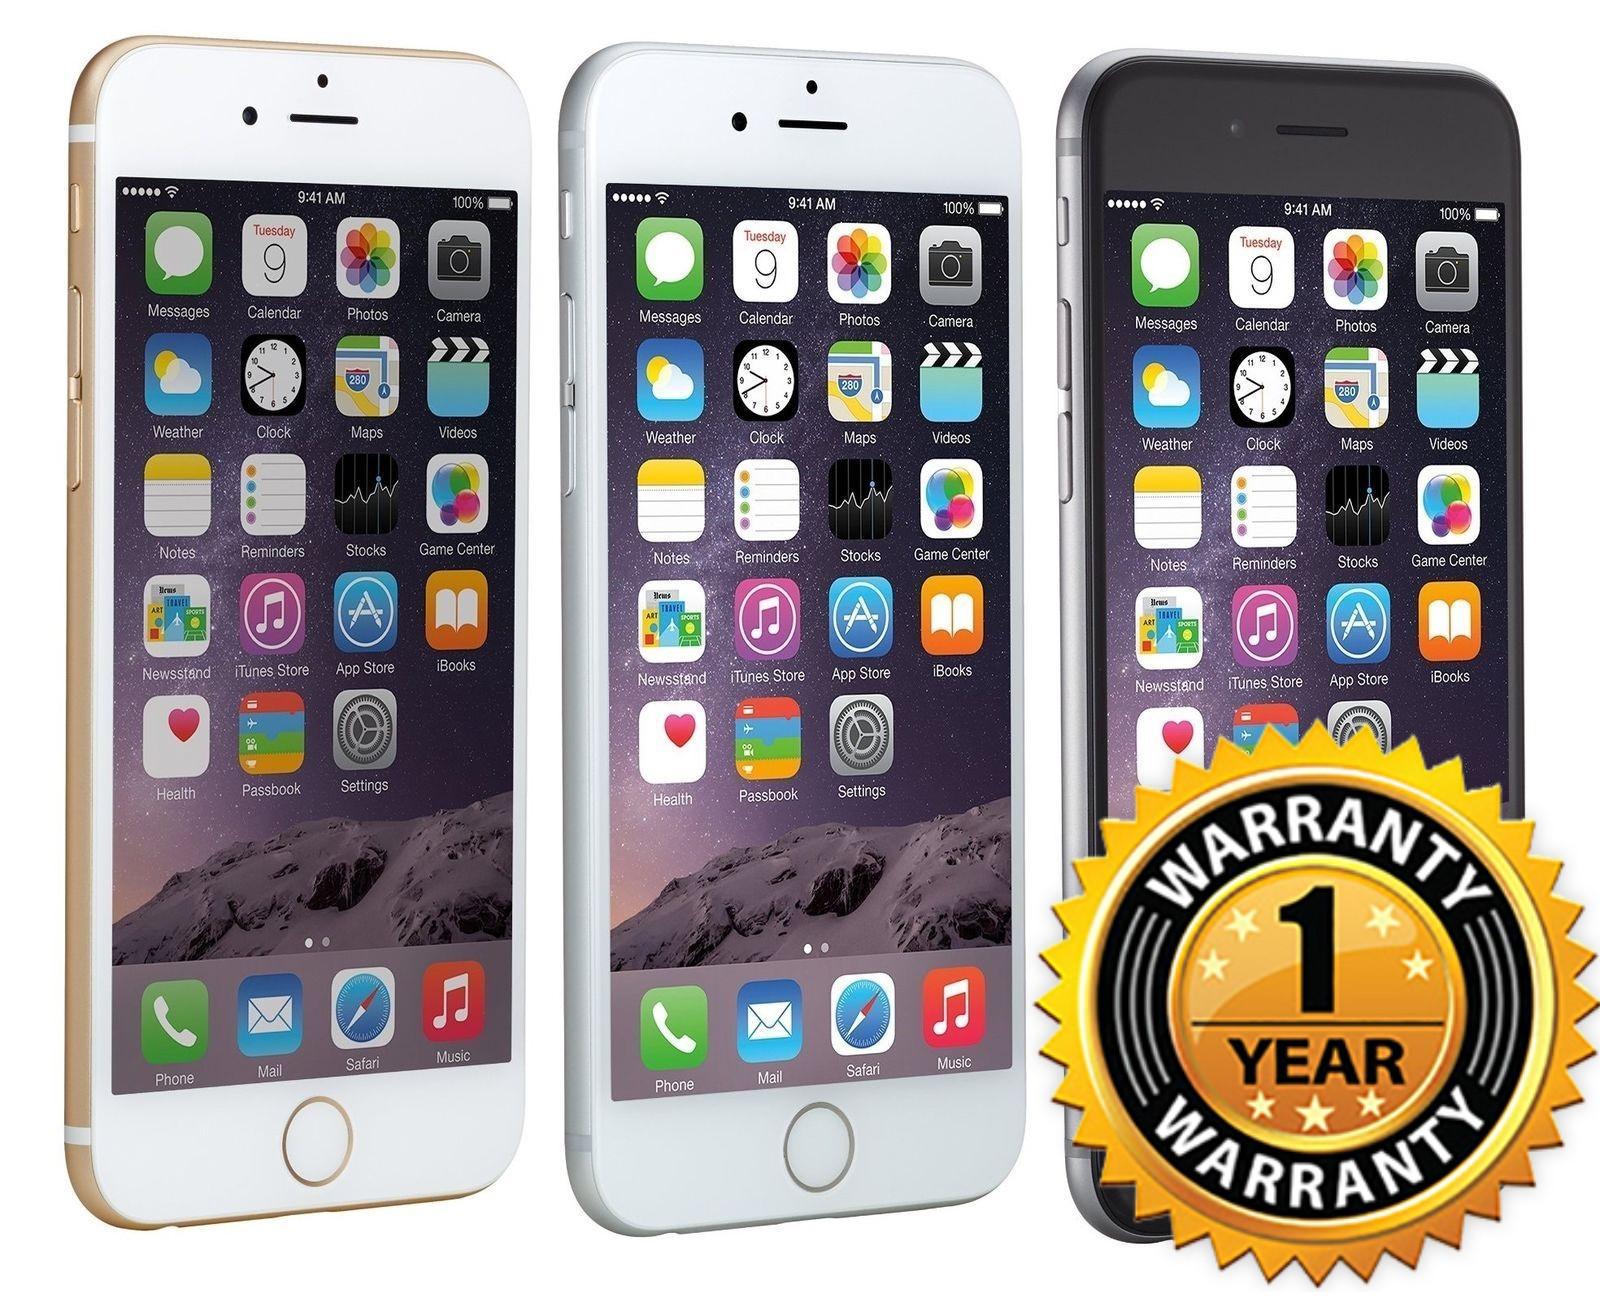 Apple iPhone 6 16GB GSM UNLOCKED 4.7